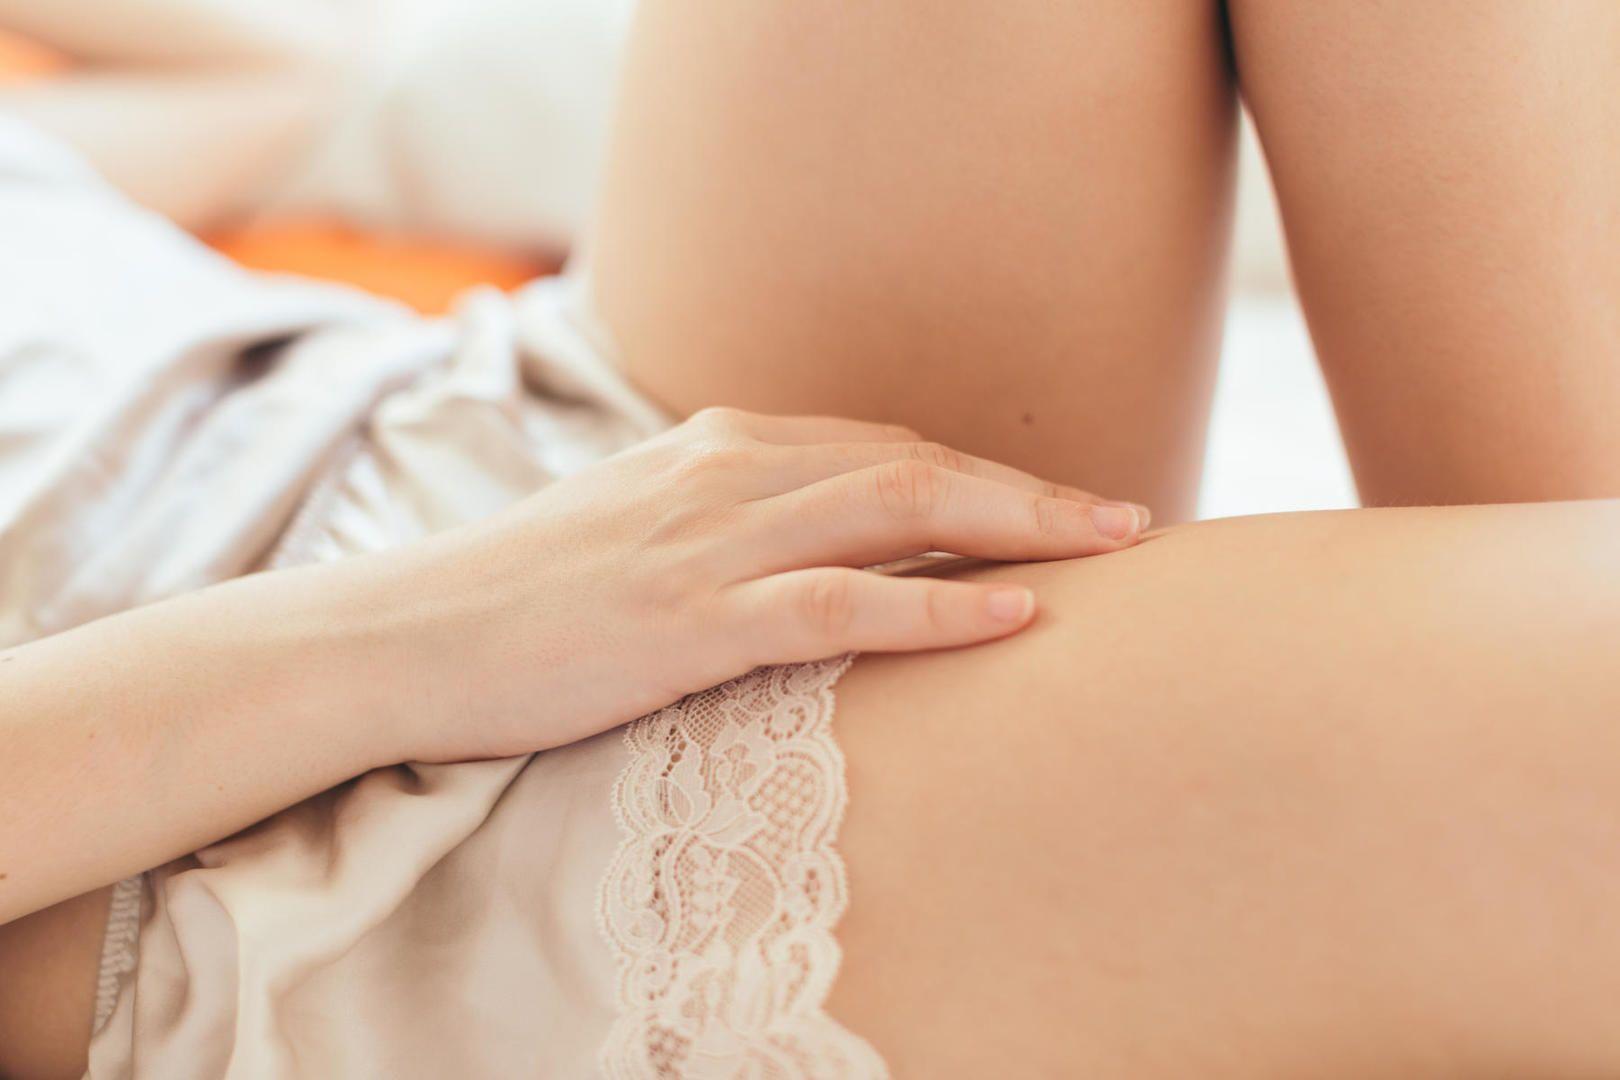 Pin on Pregnancy Fertility & Health